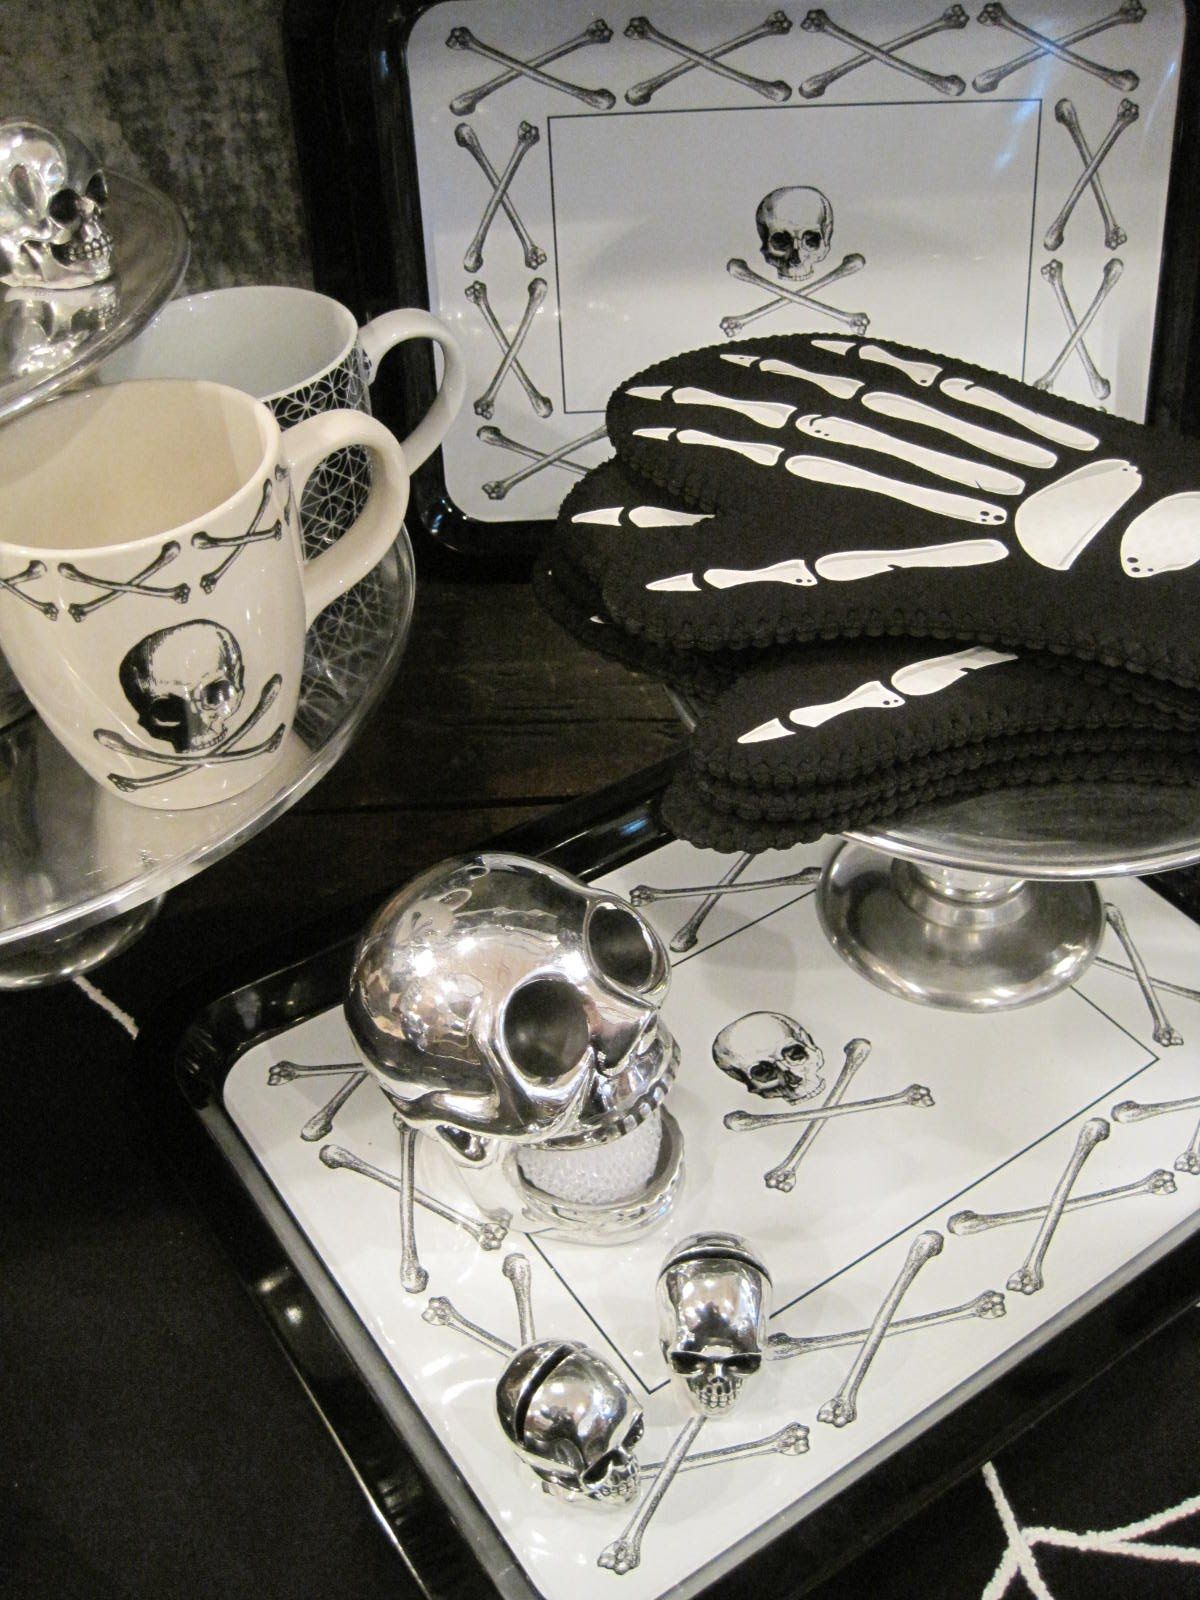 Skull kitchen collection